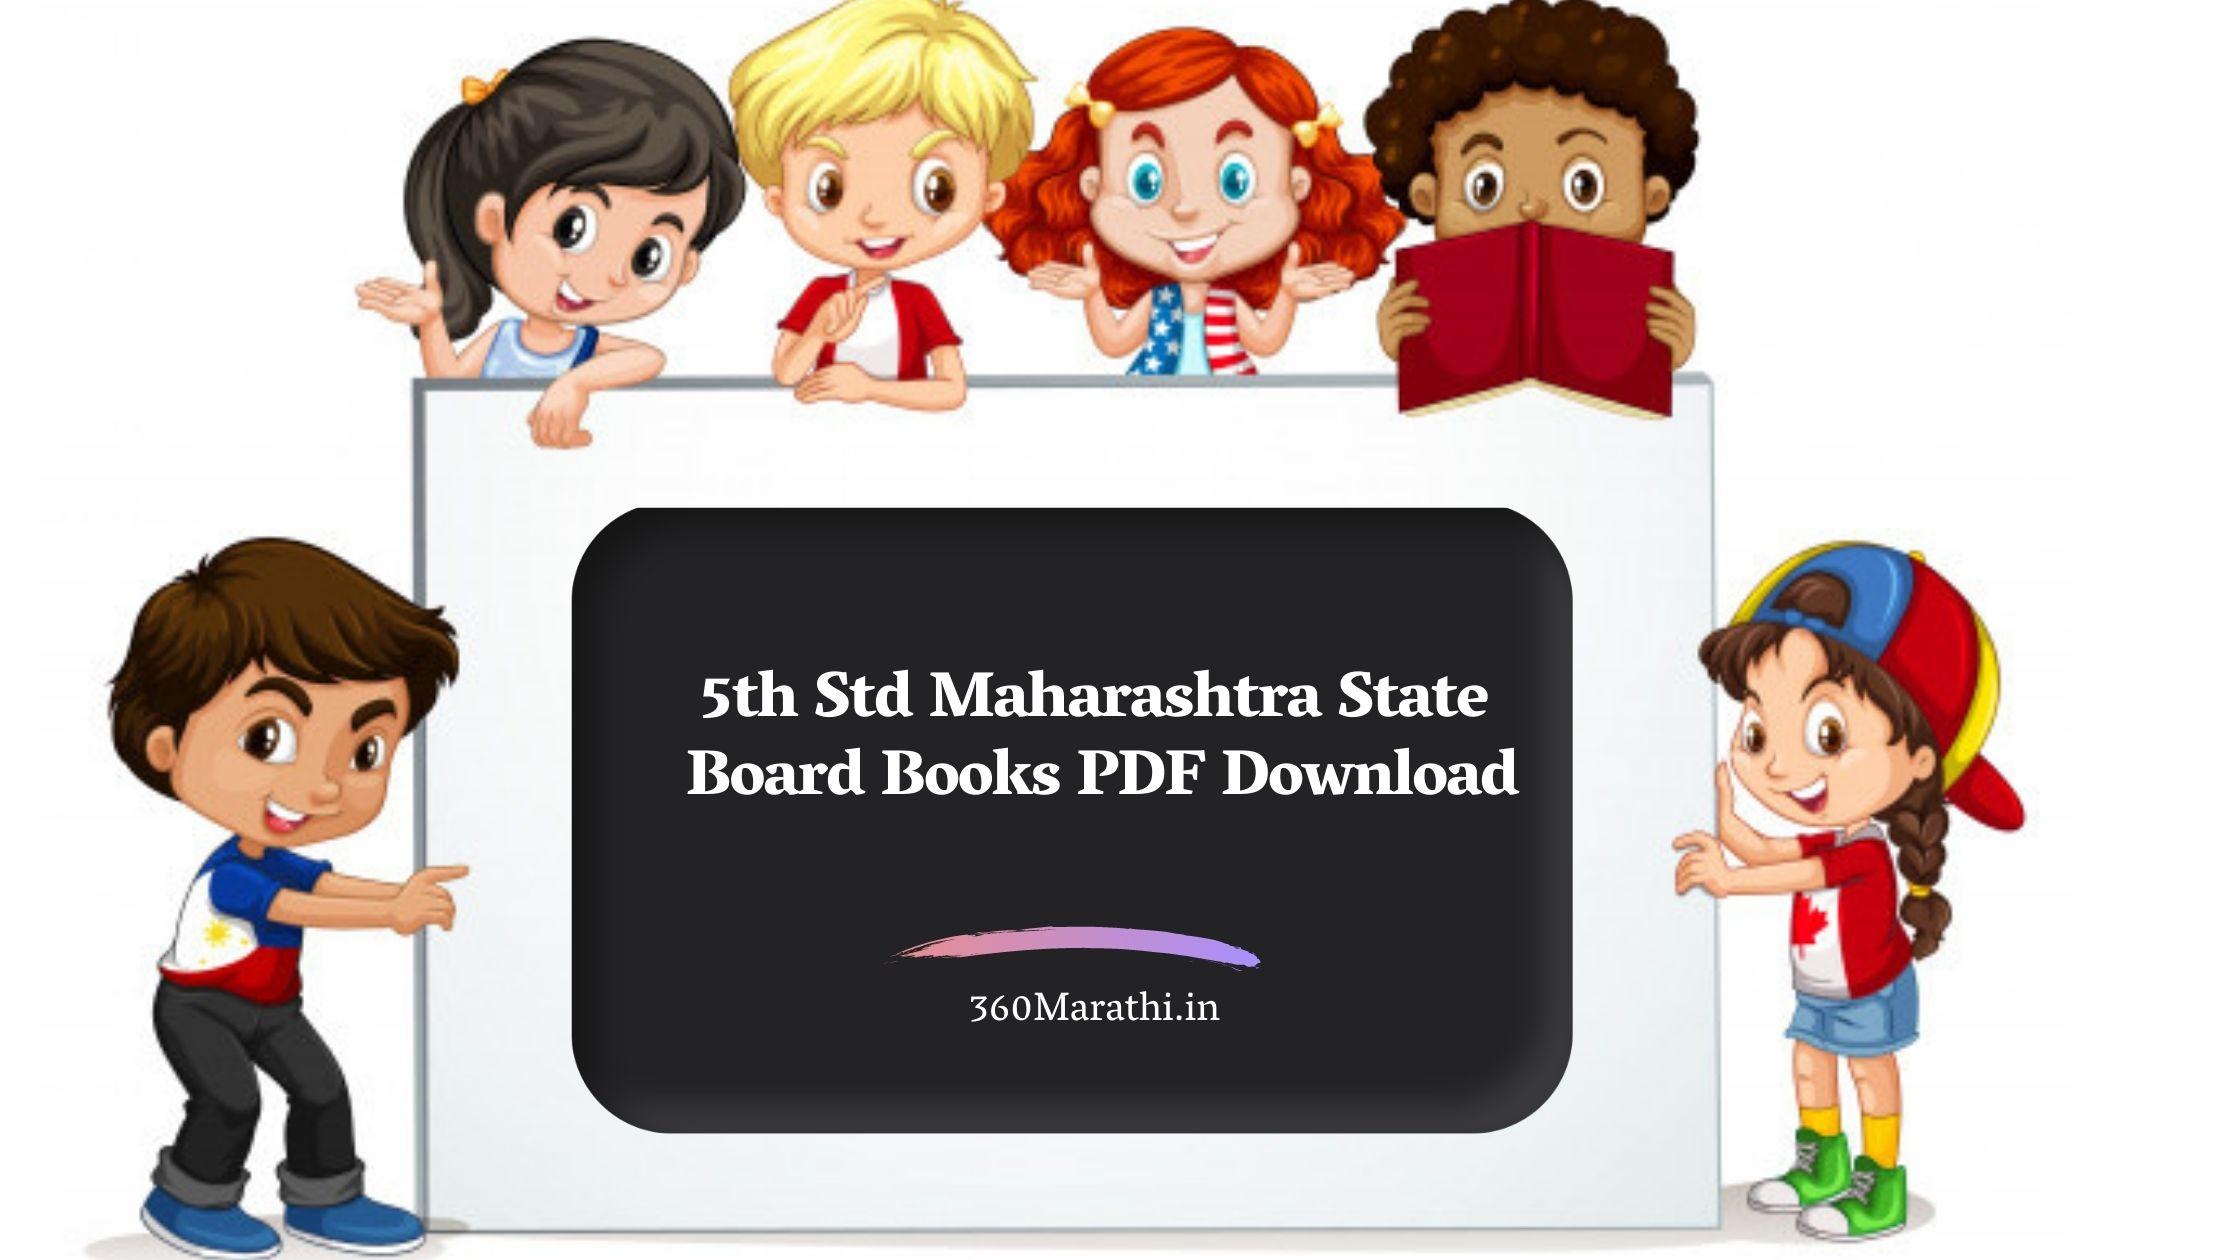 5th Std Maharashtra State Board Books PDF Download